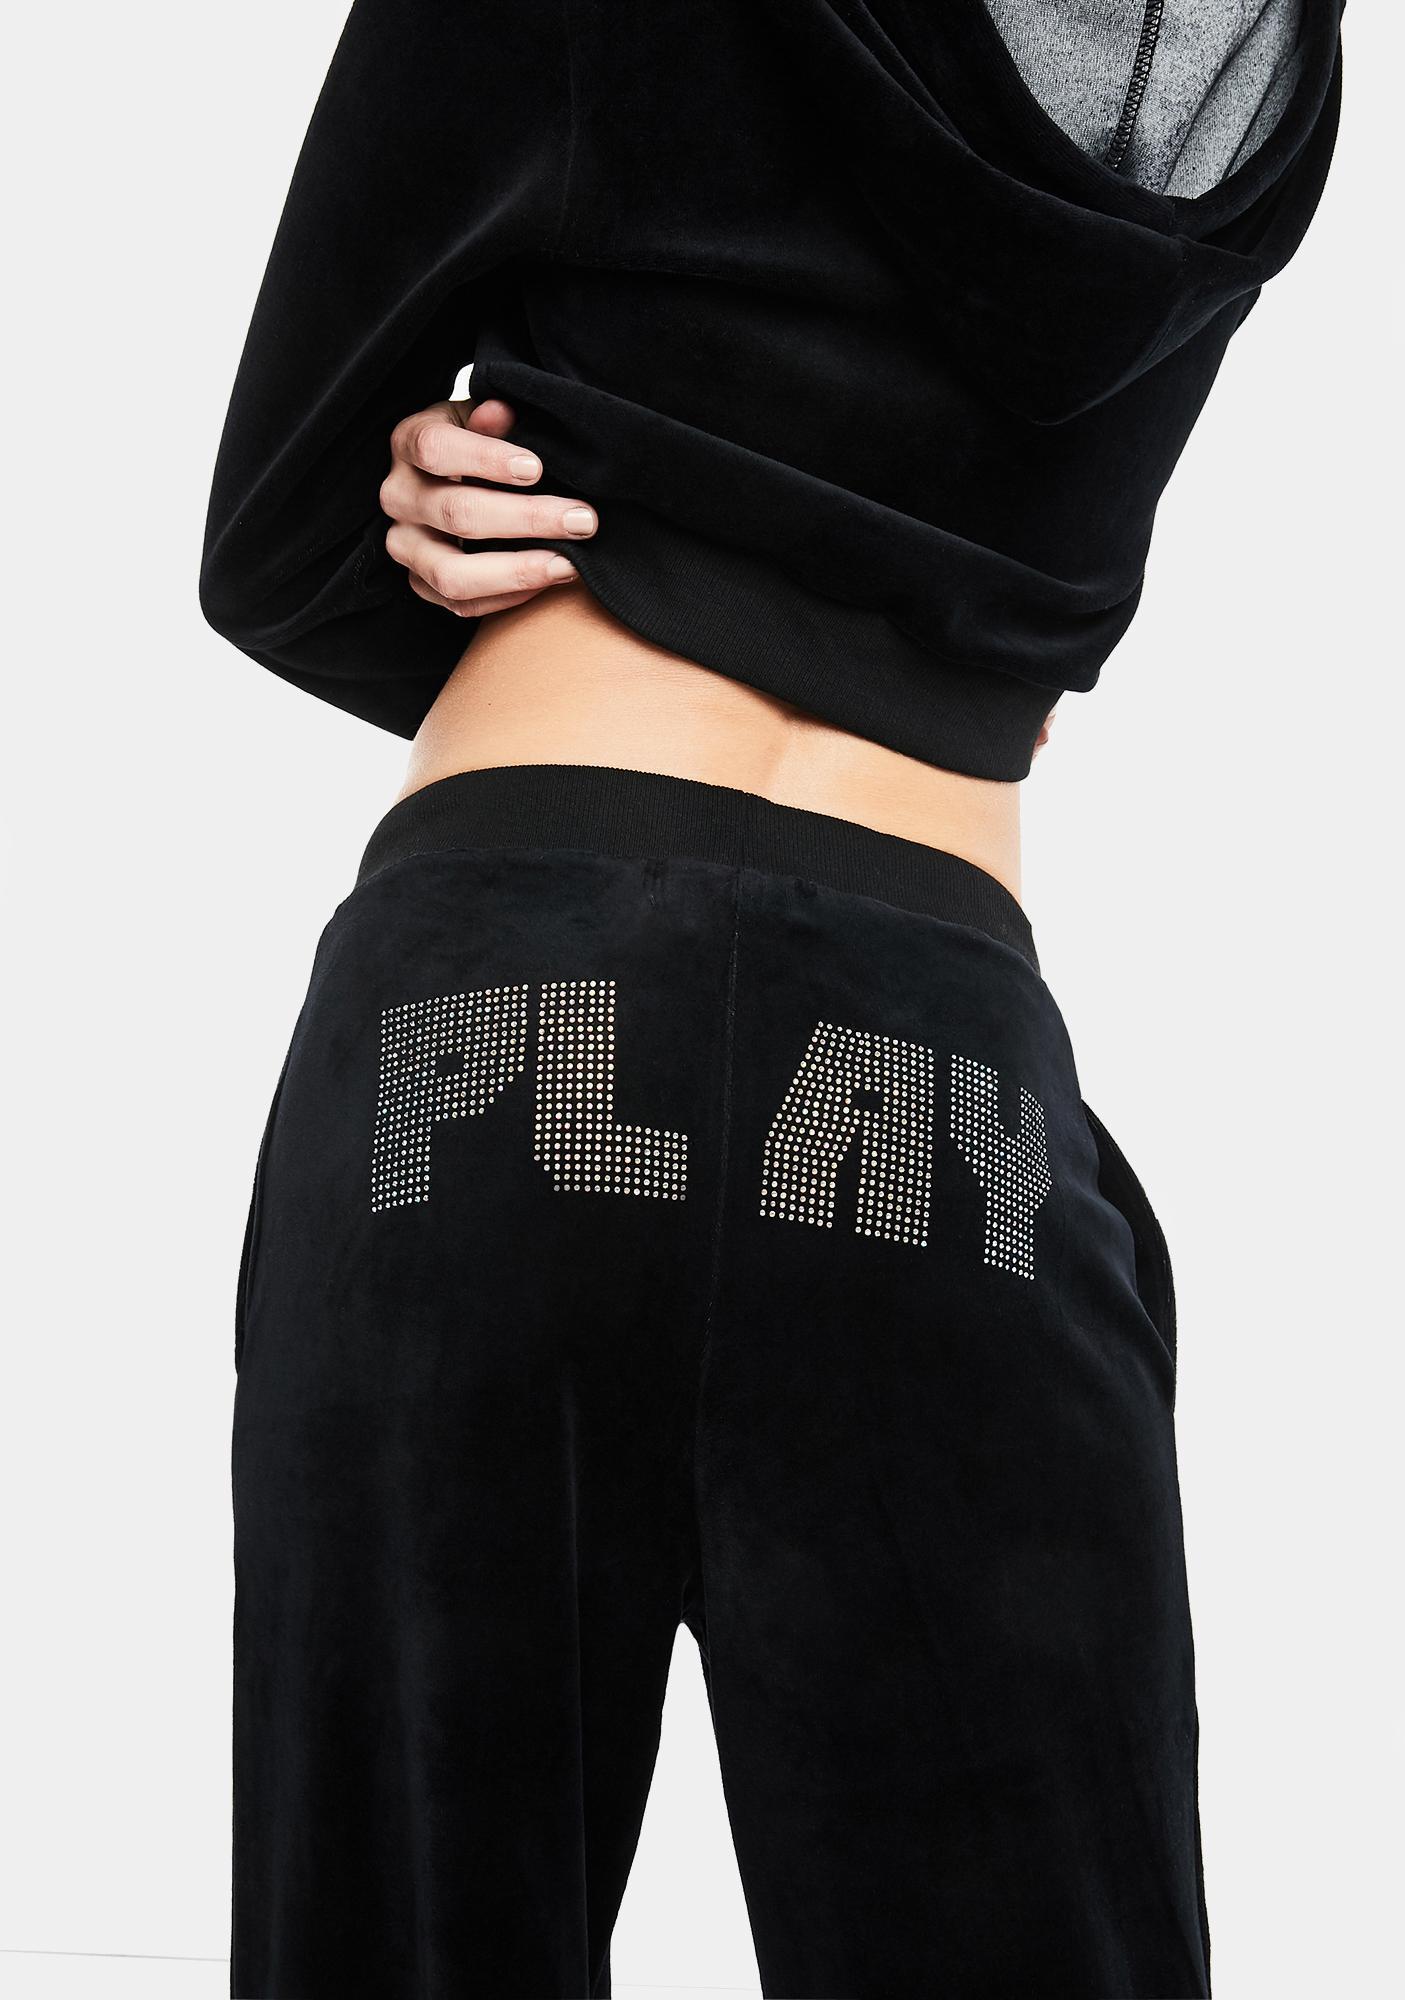 Club Exx Press Play Velour Track Pants